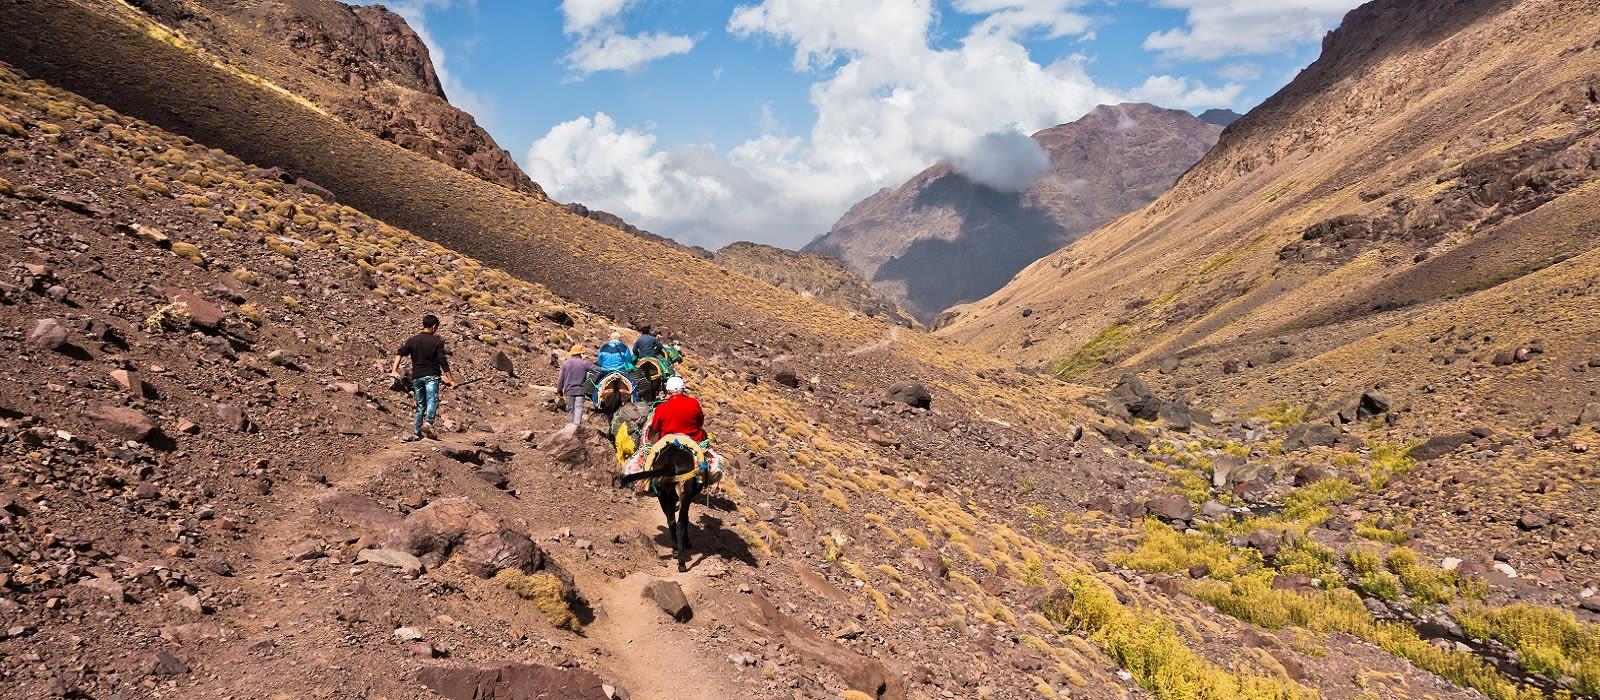 Marokko: Königsstädte & Bergwelten Urlaub 3